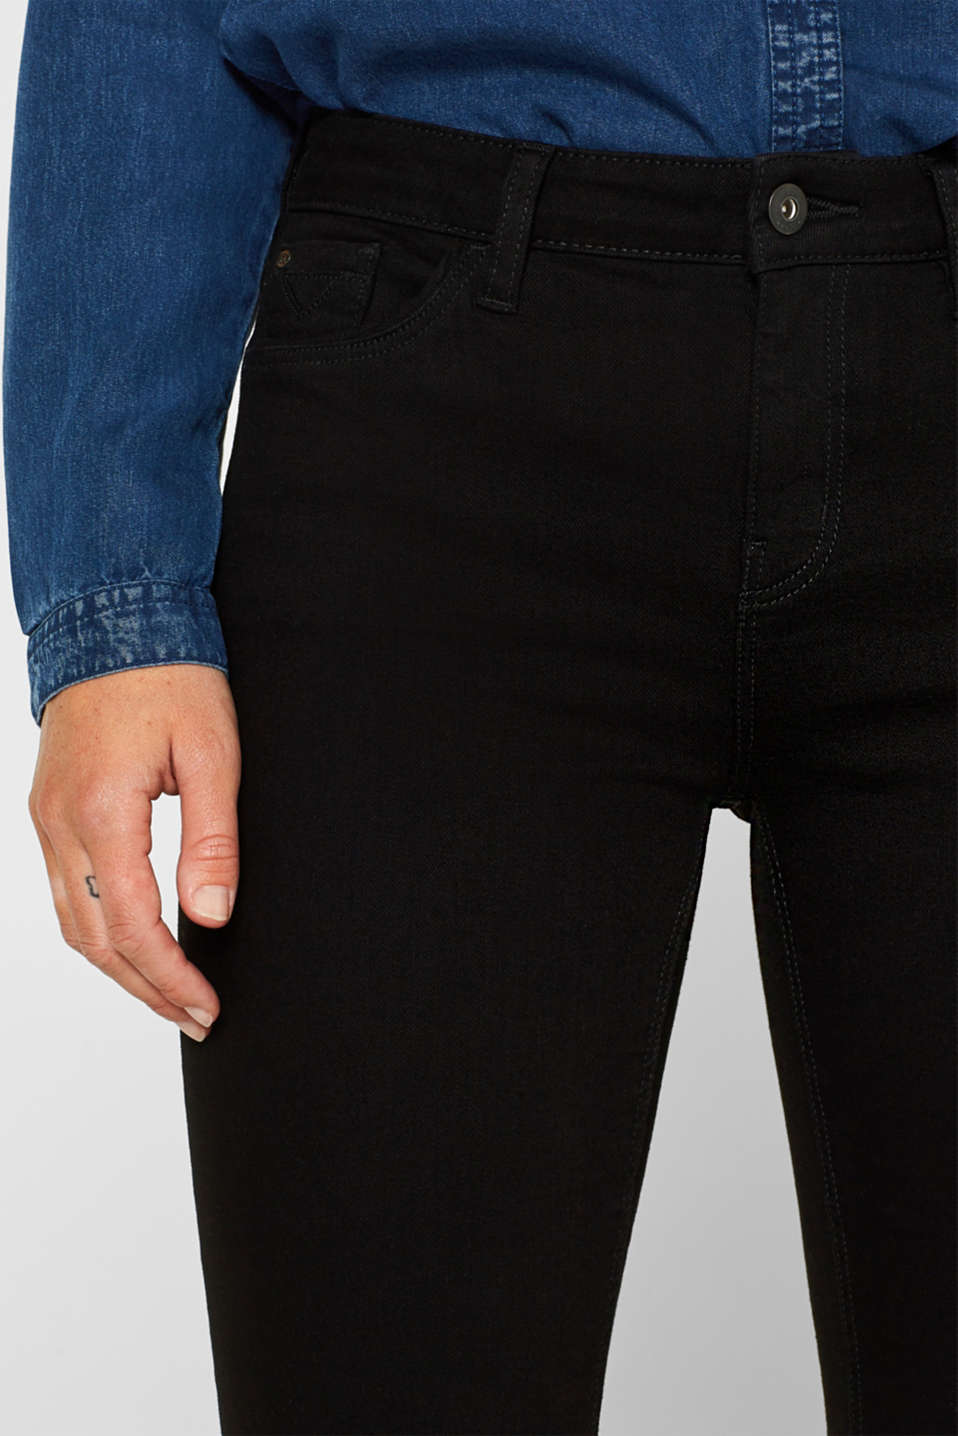 Pants denim, BLACK RINSE, detail image number 5